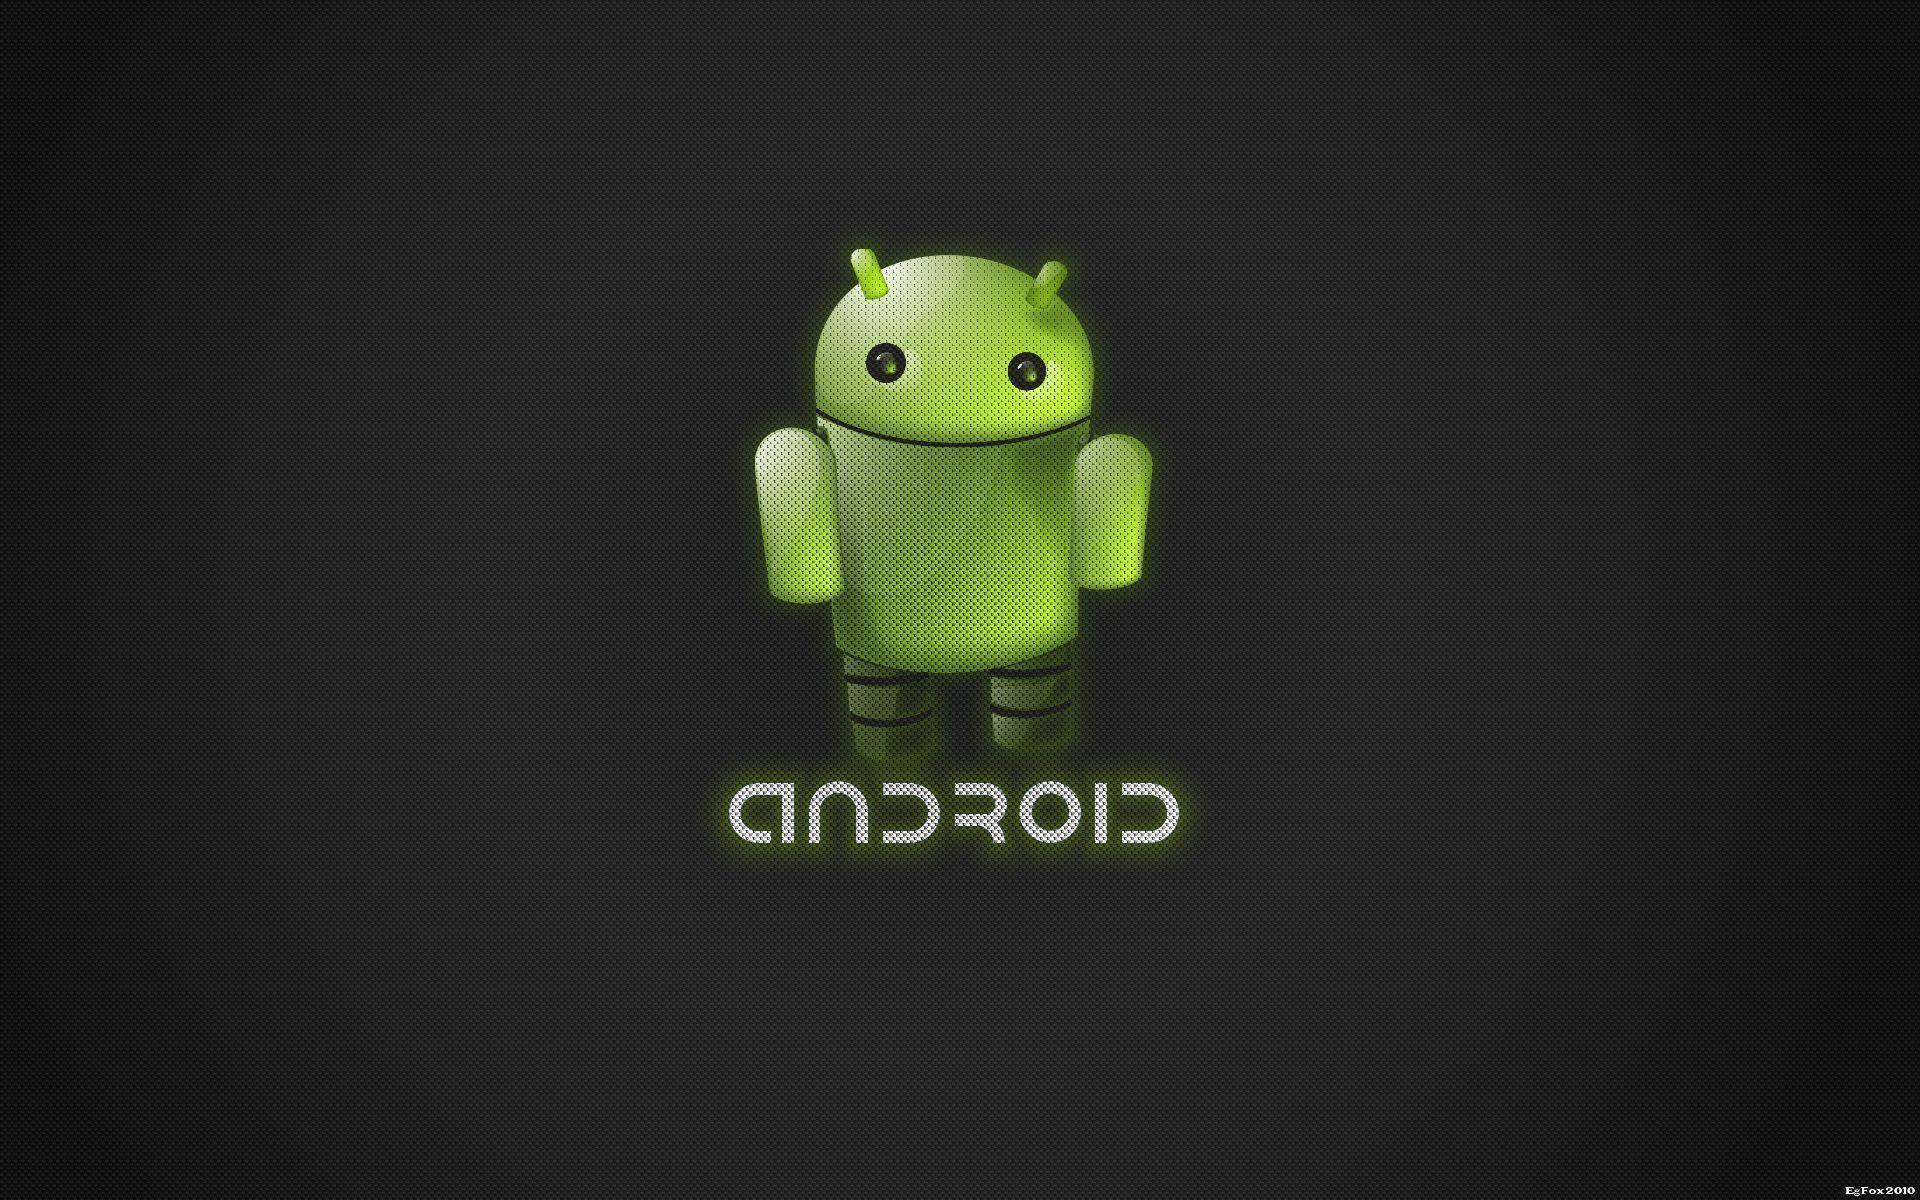 Logos For > Android Logo Wallpaper Hd